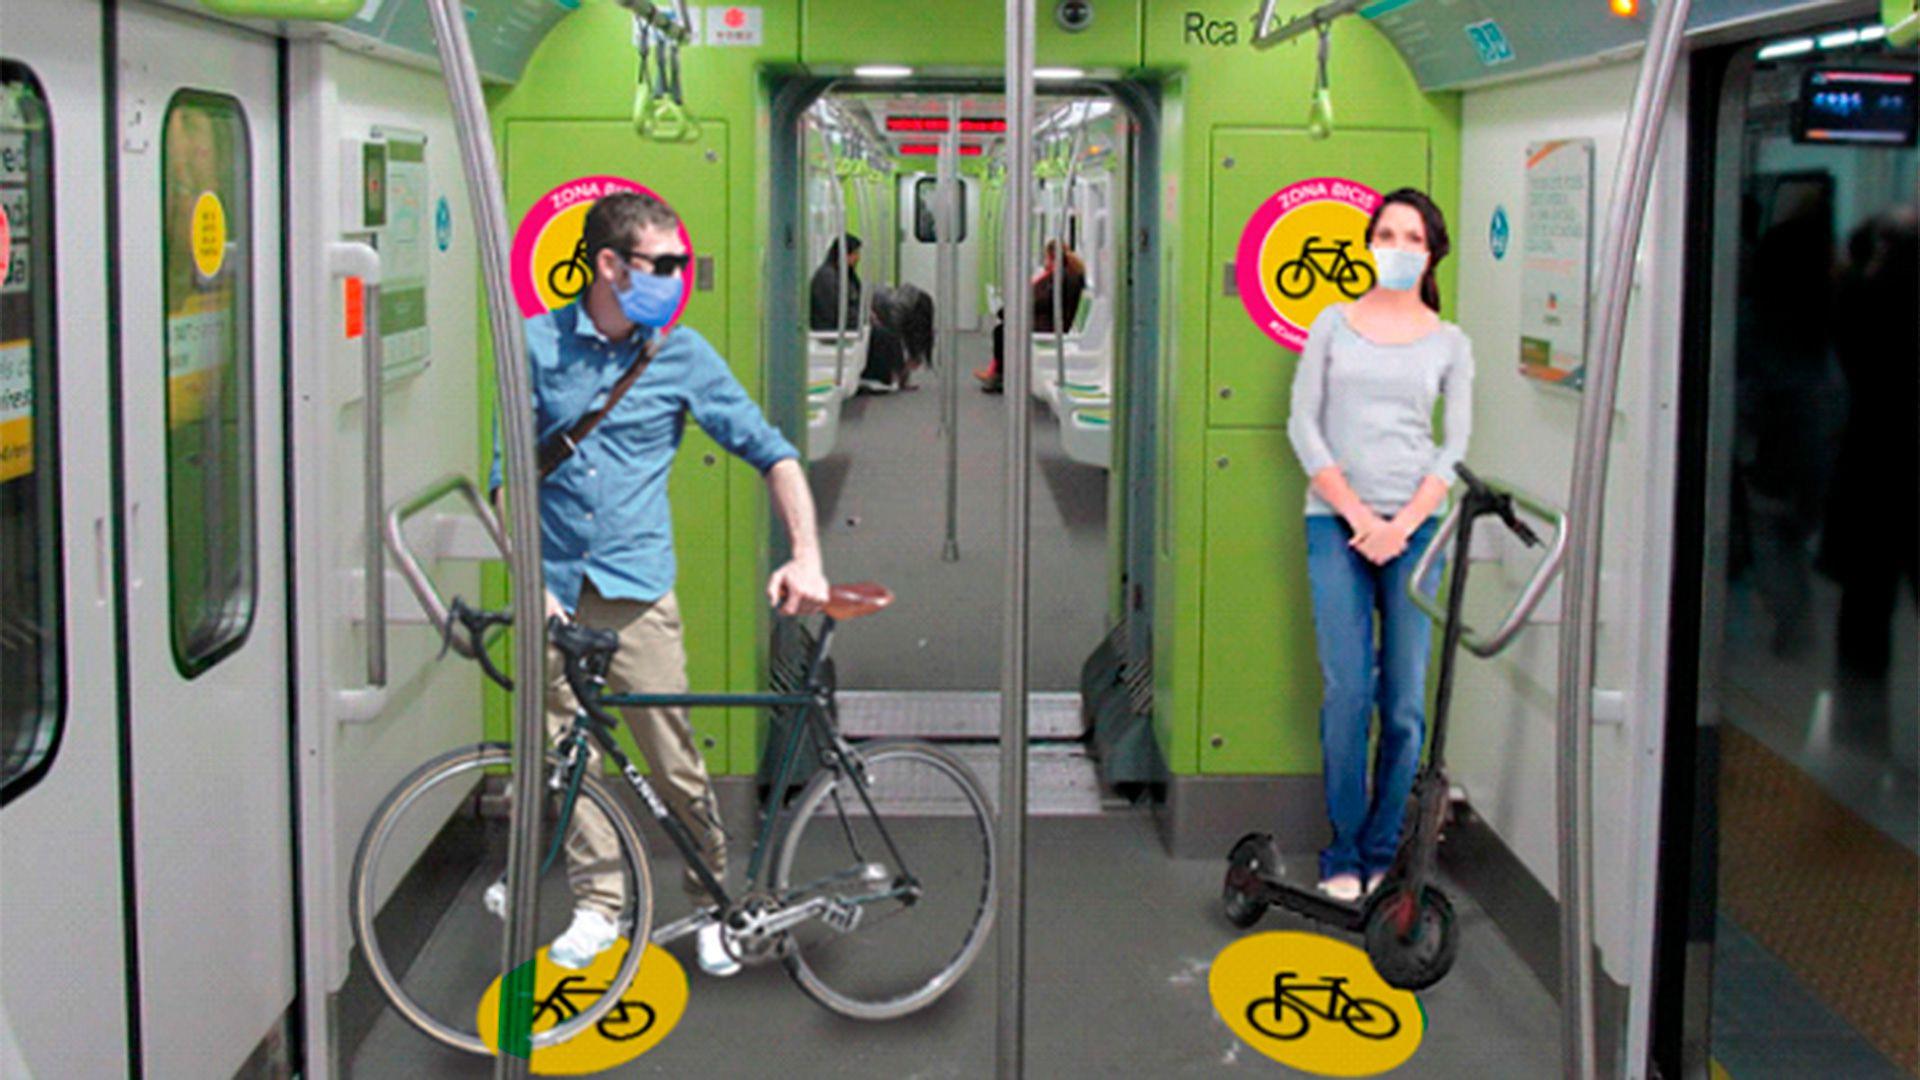 bicicletas monopatin subte coronavirus cuarentena